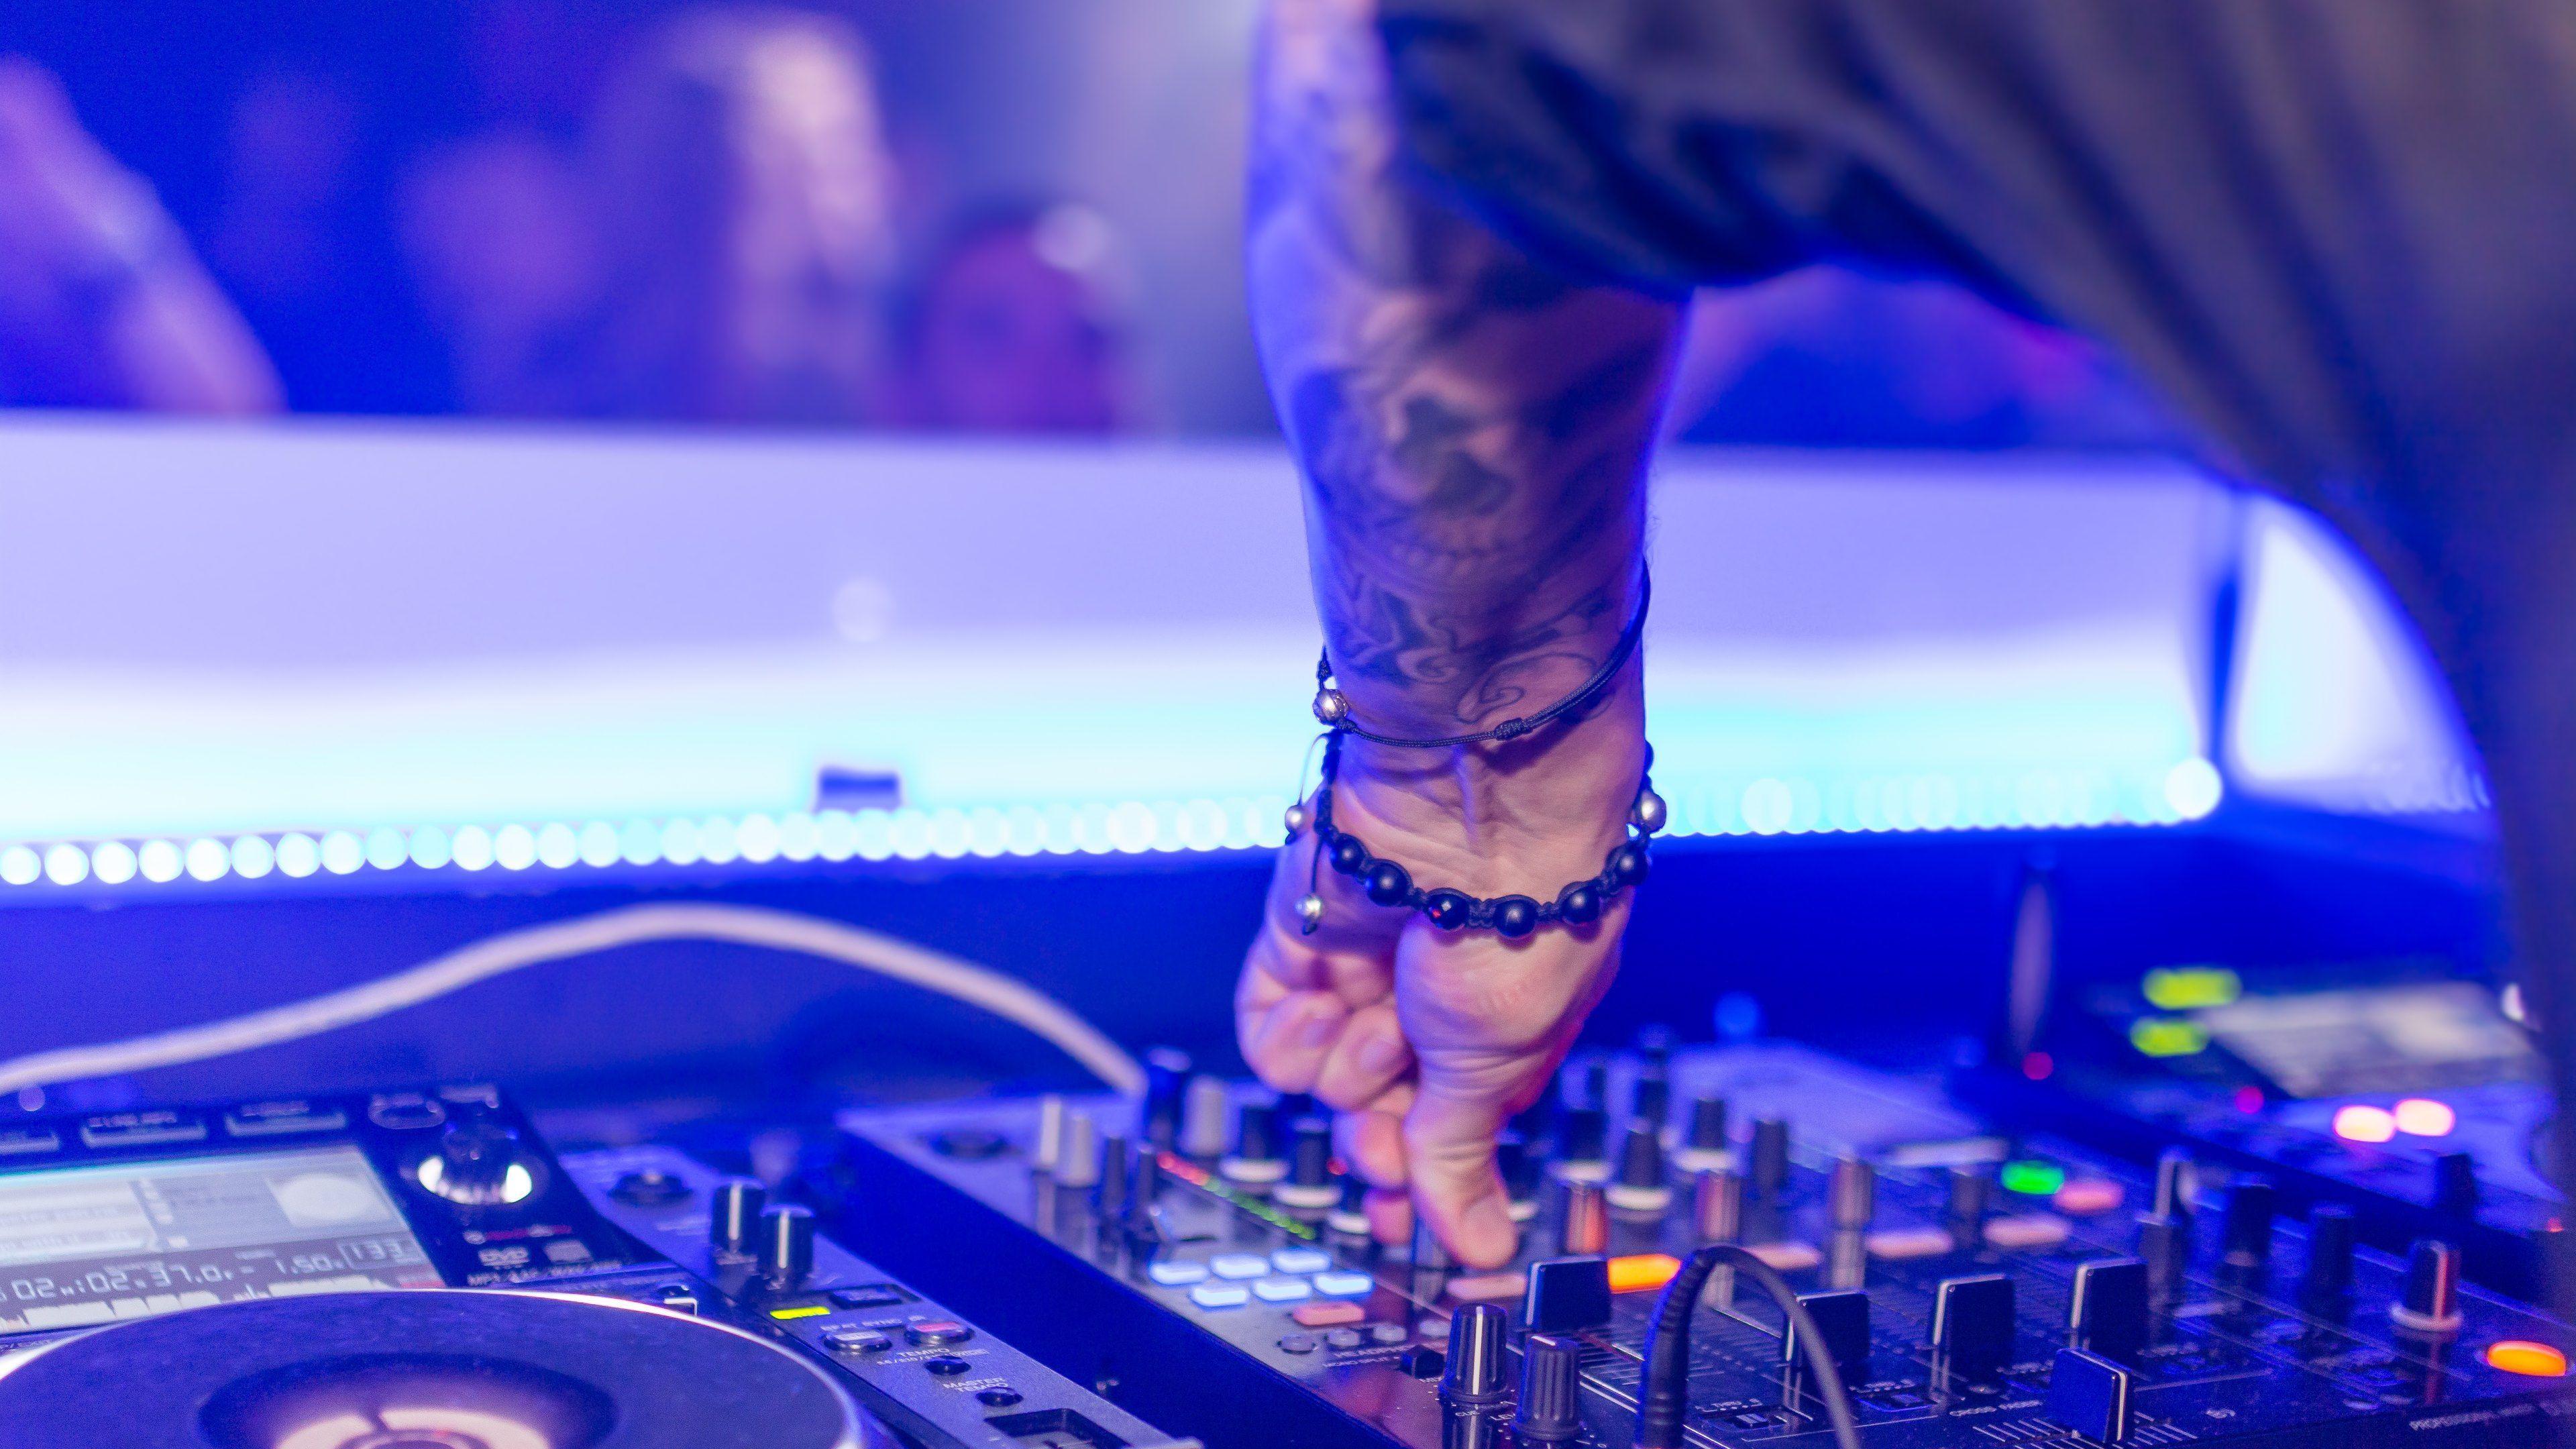 Dj Wallpapers Hd 2016: Wallpapers DJ 2016